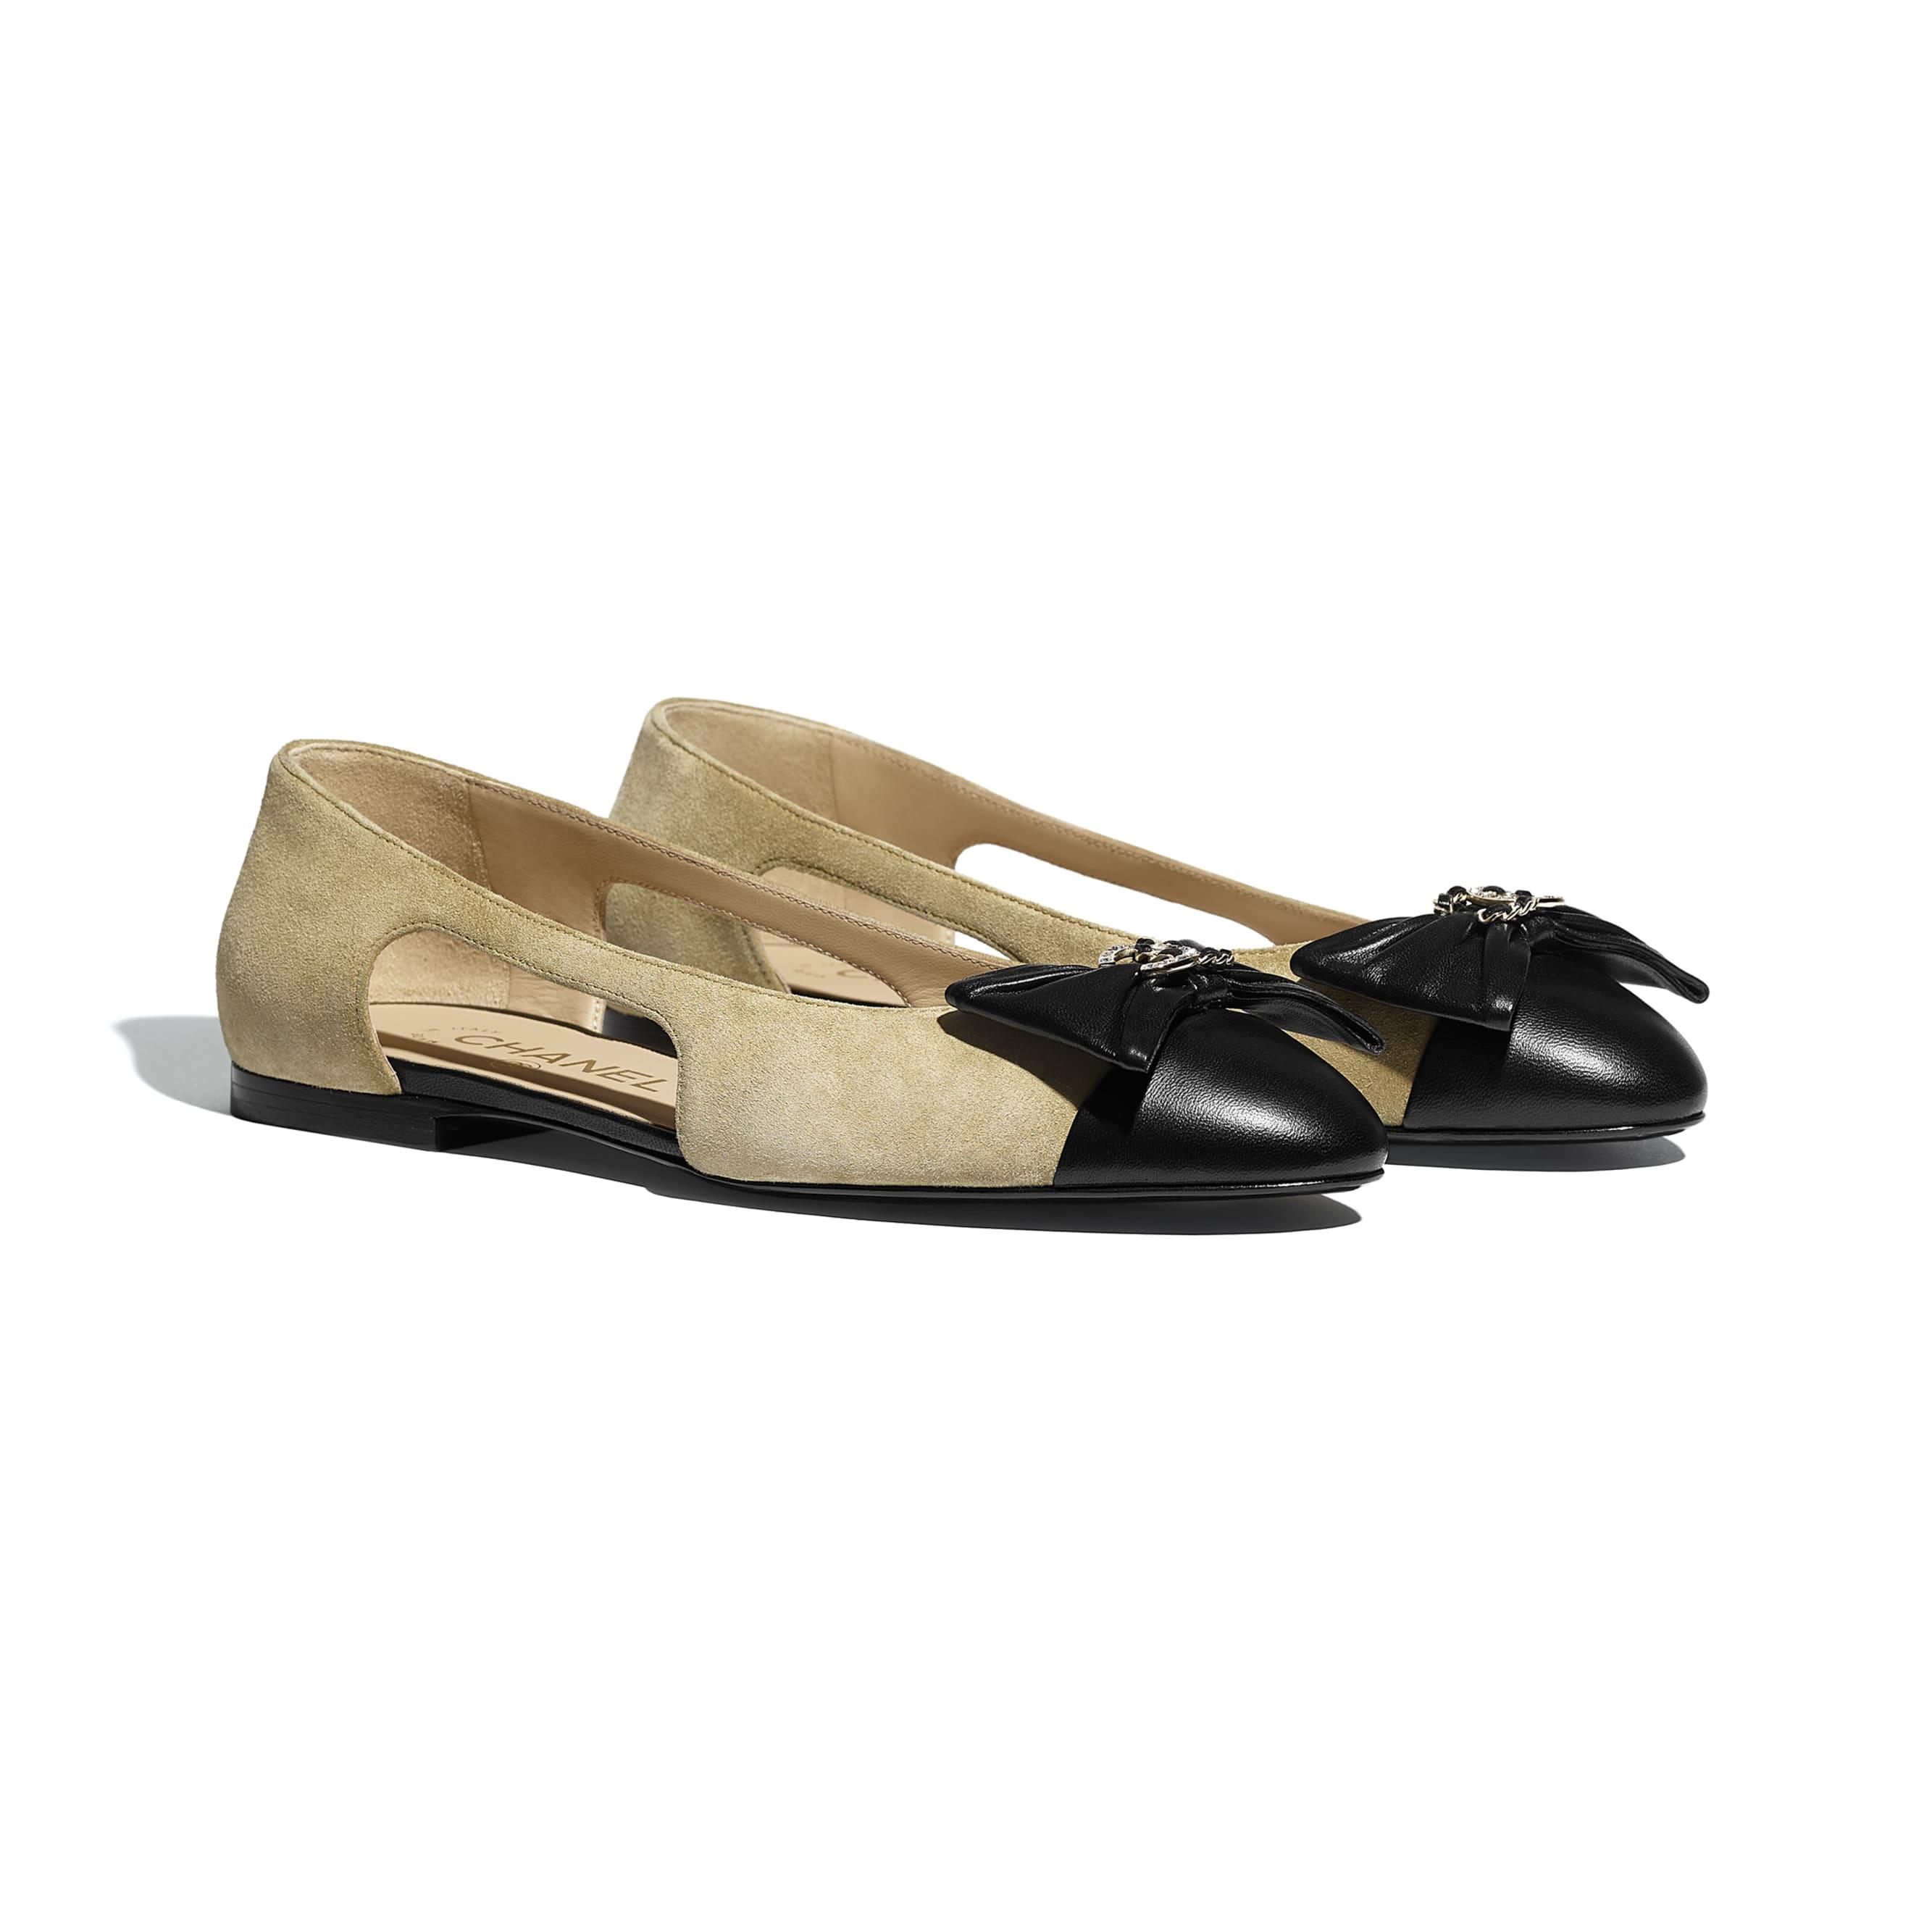 Flats - Beige & Black - Suede Calfskin & Lambskin - CHANEL - Alternative view - see standard sized version